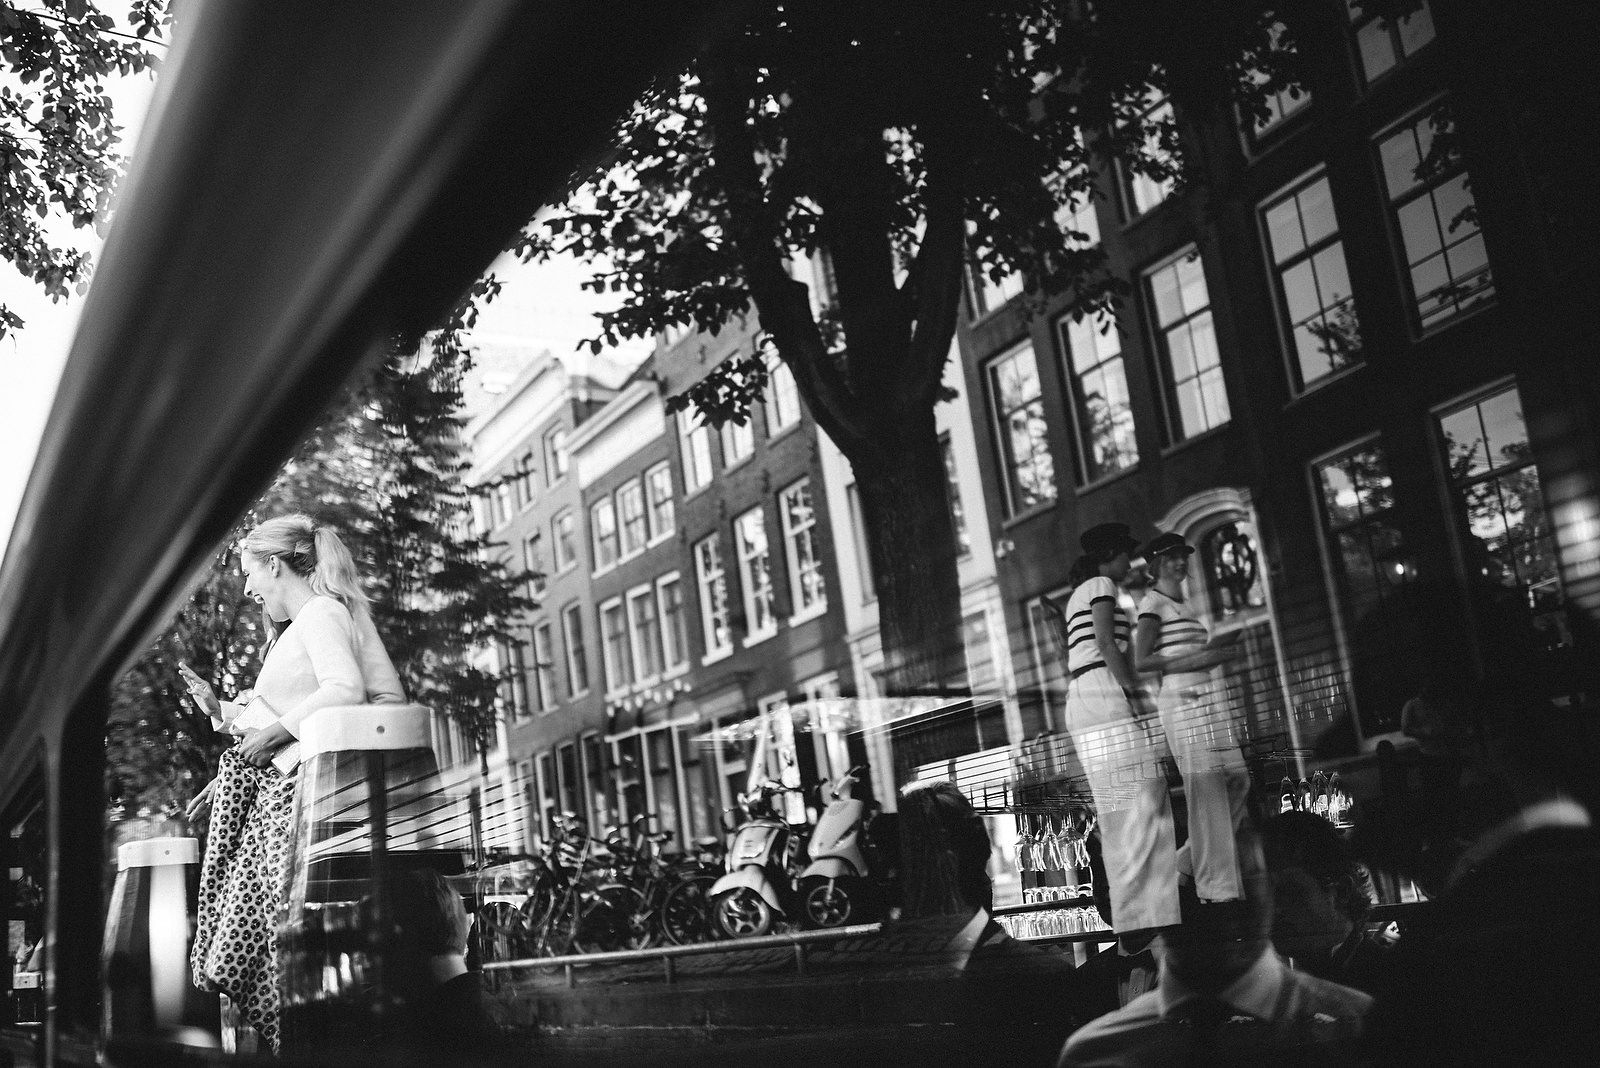 Fotograf Konstanz - Destination Wedding Photographer Amsterdam 094 - Destination Wedding Amsterdam  - 199 -